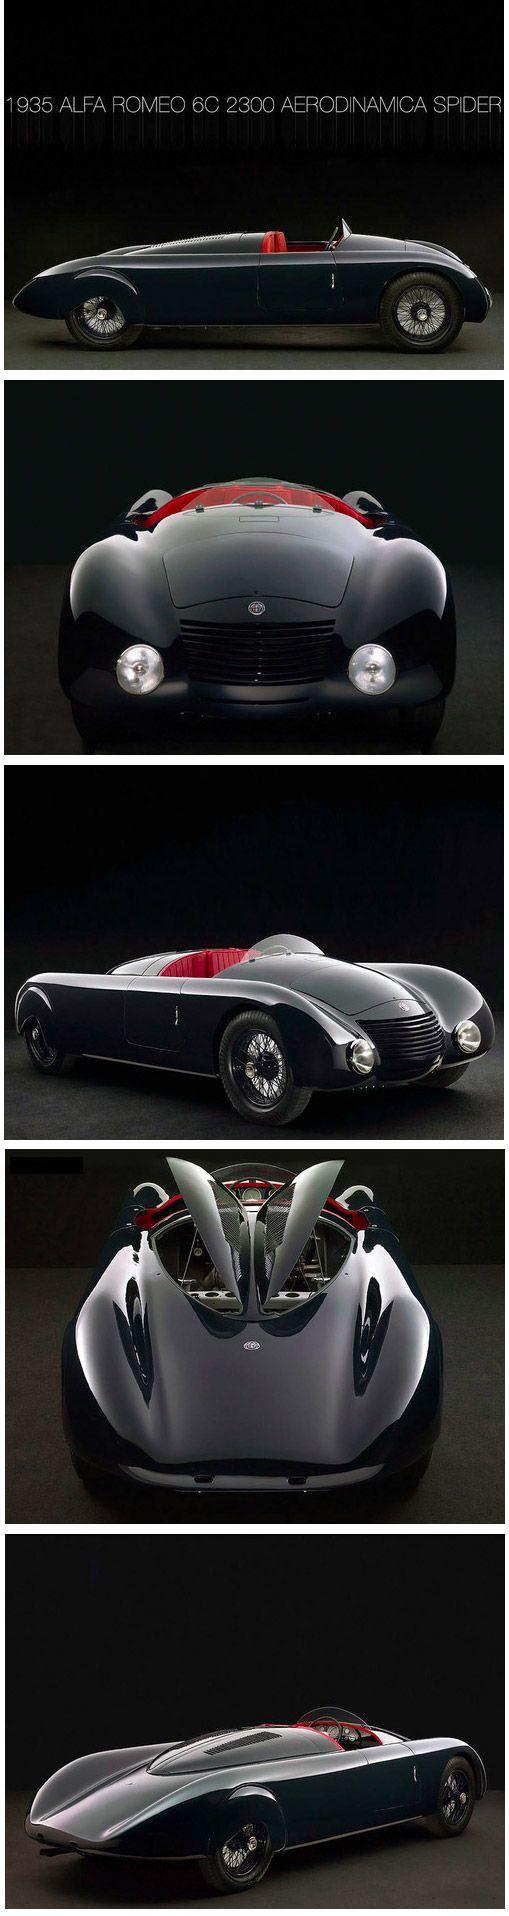 ❤ The Best of Alfa Roméo... ❤ (1935 Alfa Roméo 6C 2300 Aerodinamica Spyder)